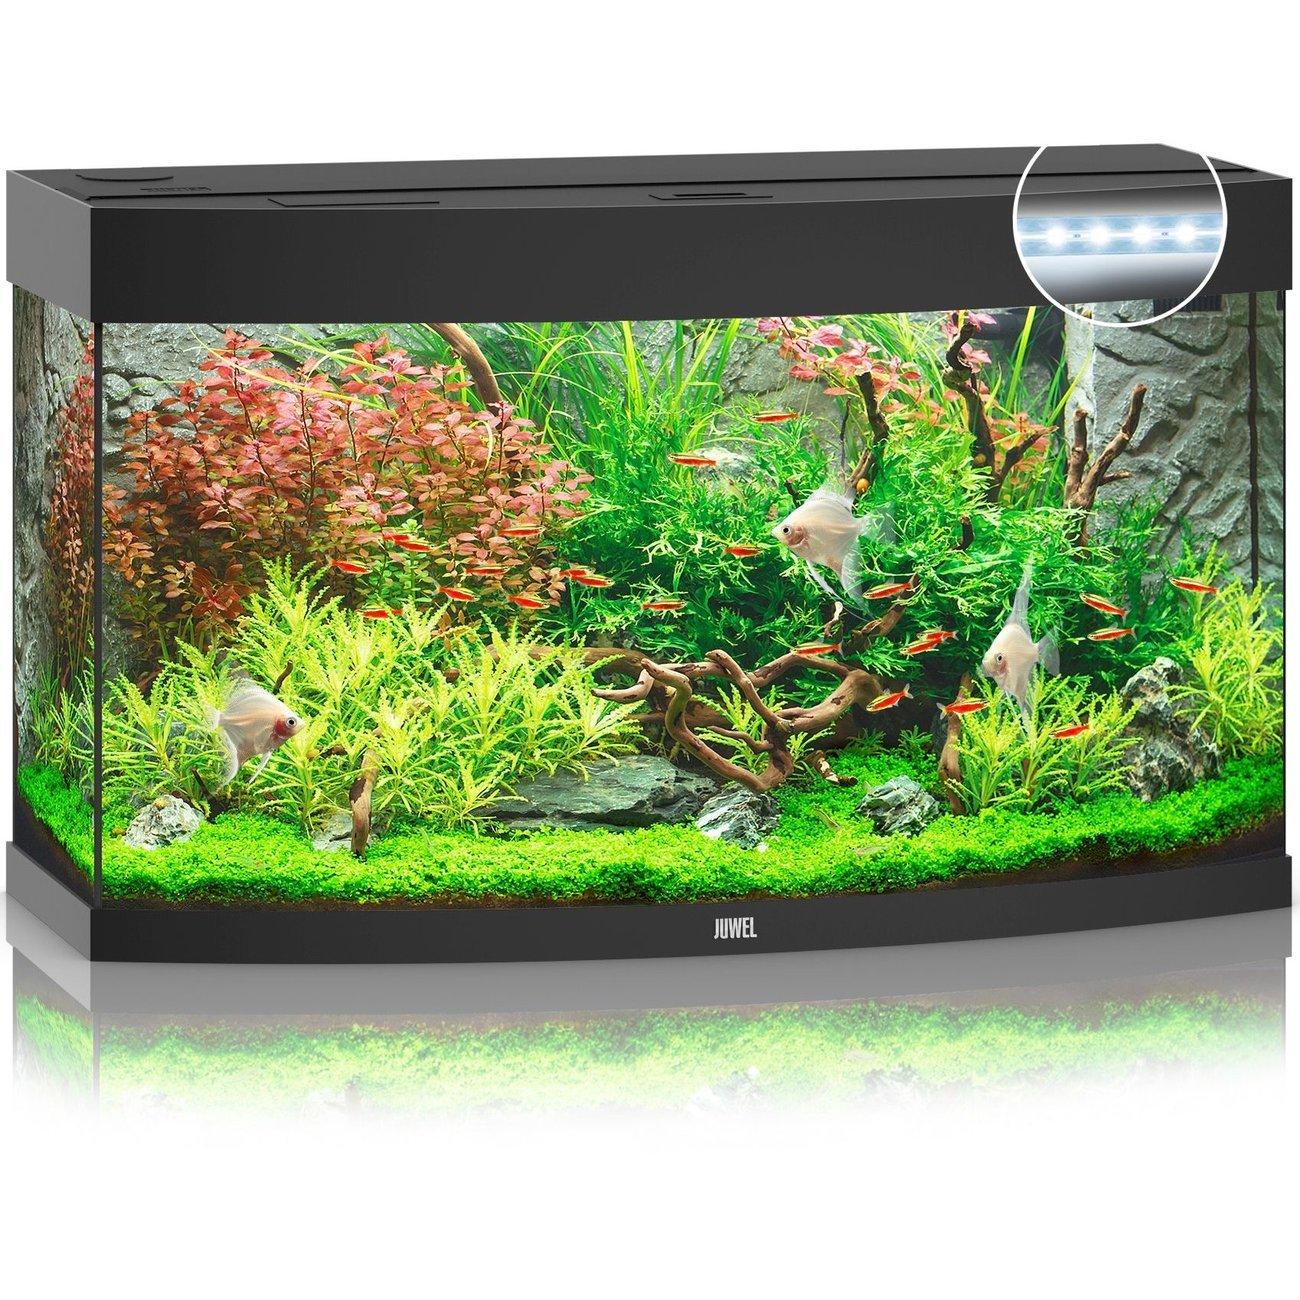 JUWEL Vision 180 LED Aquarium, 180 Liter, schwarz